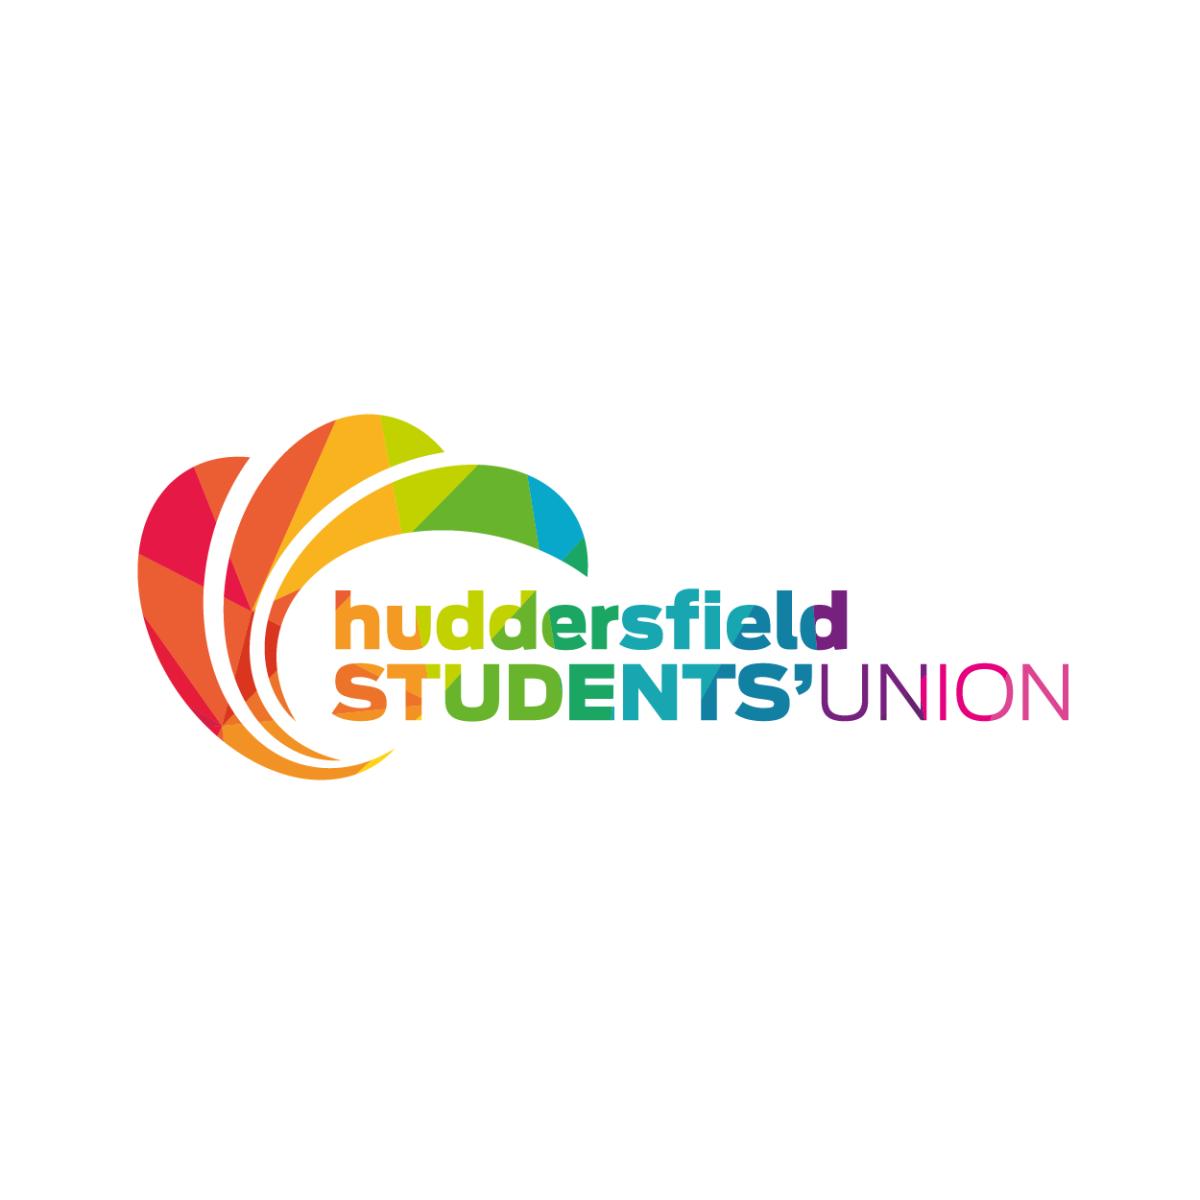 Huddersfield Students' Union